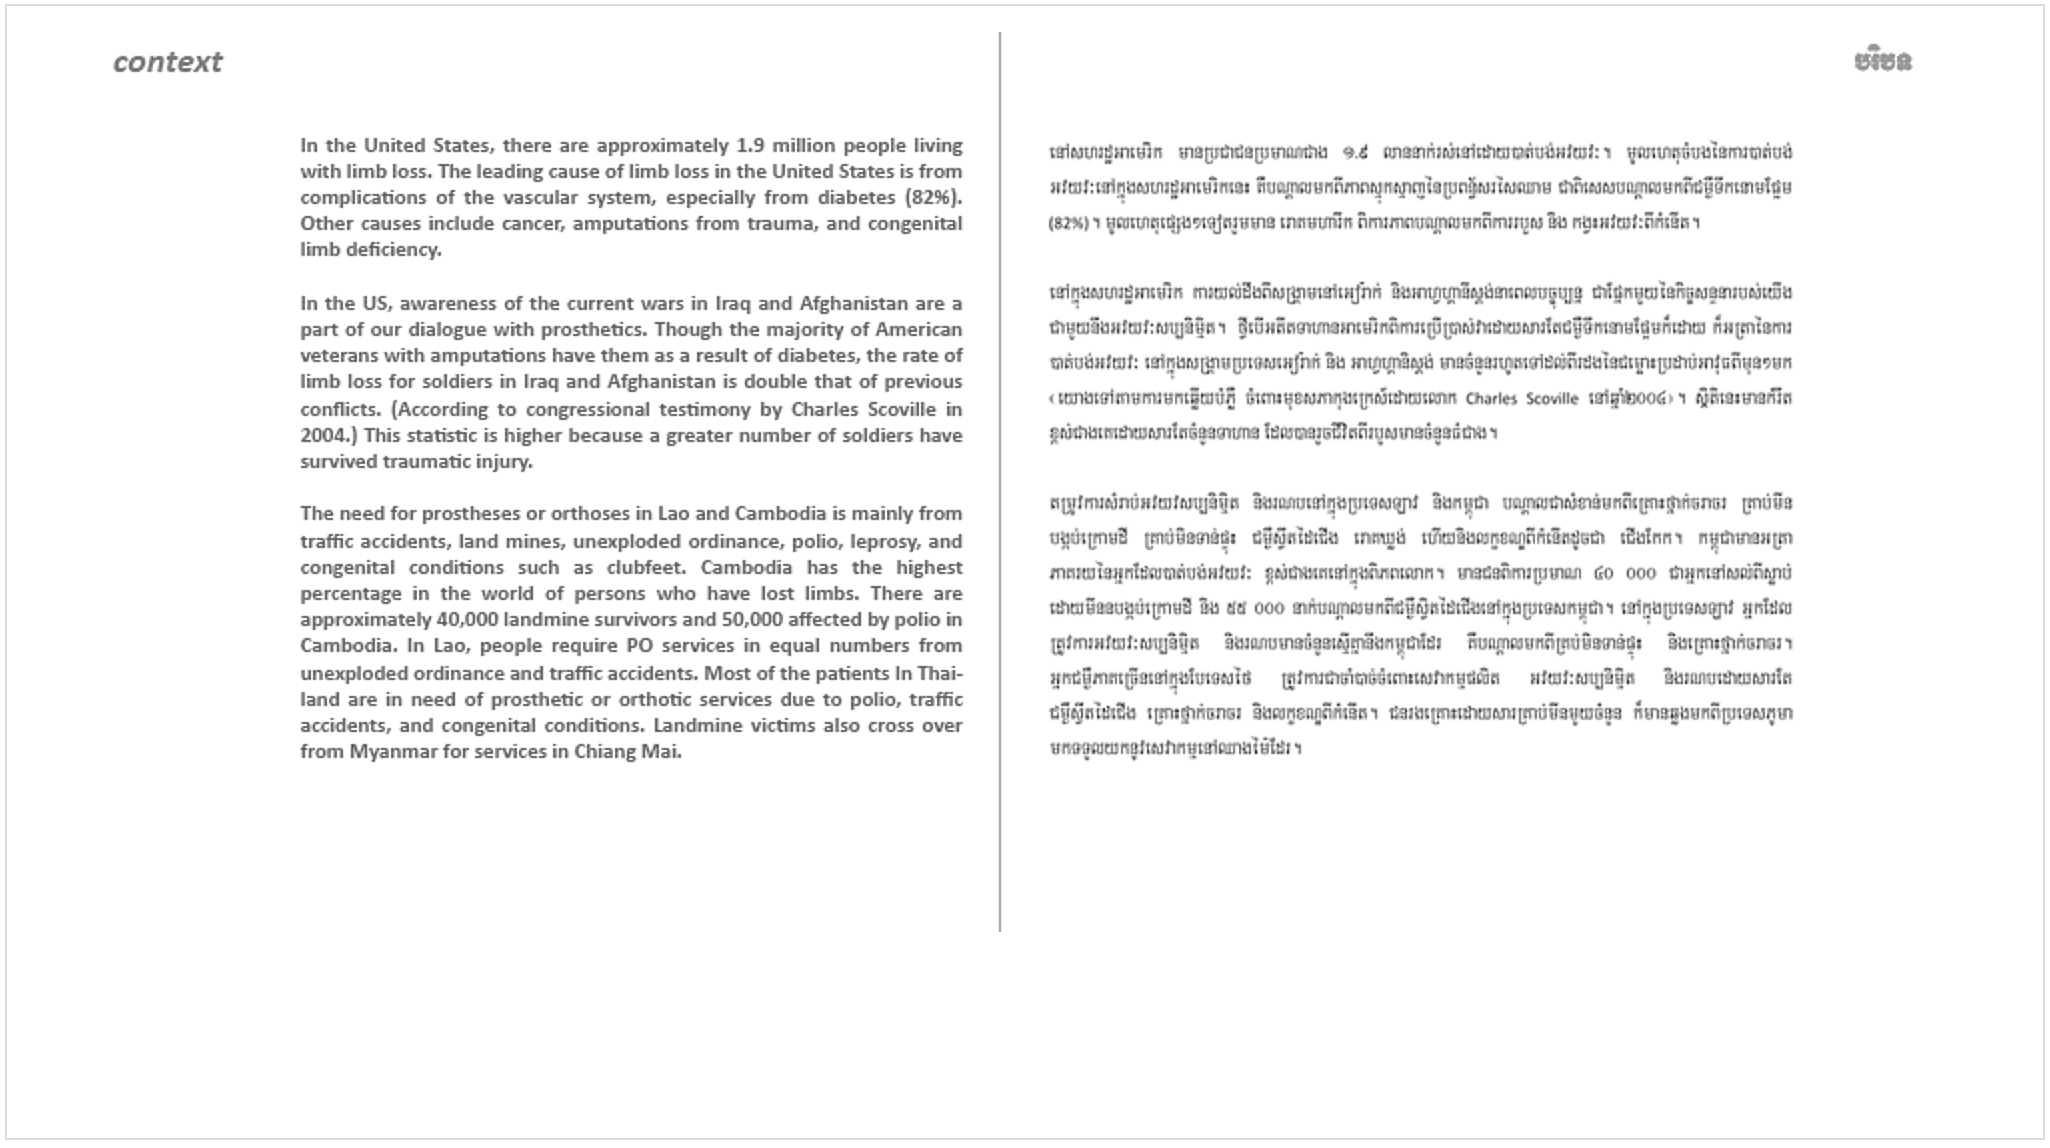 pg 54 copy.jpg